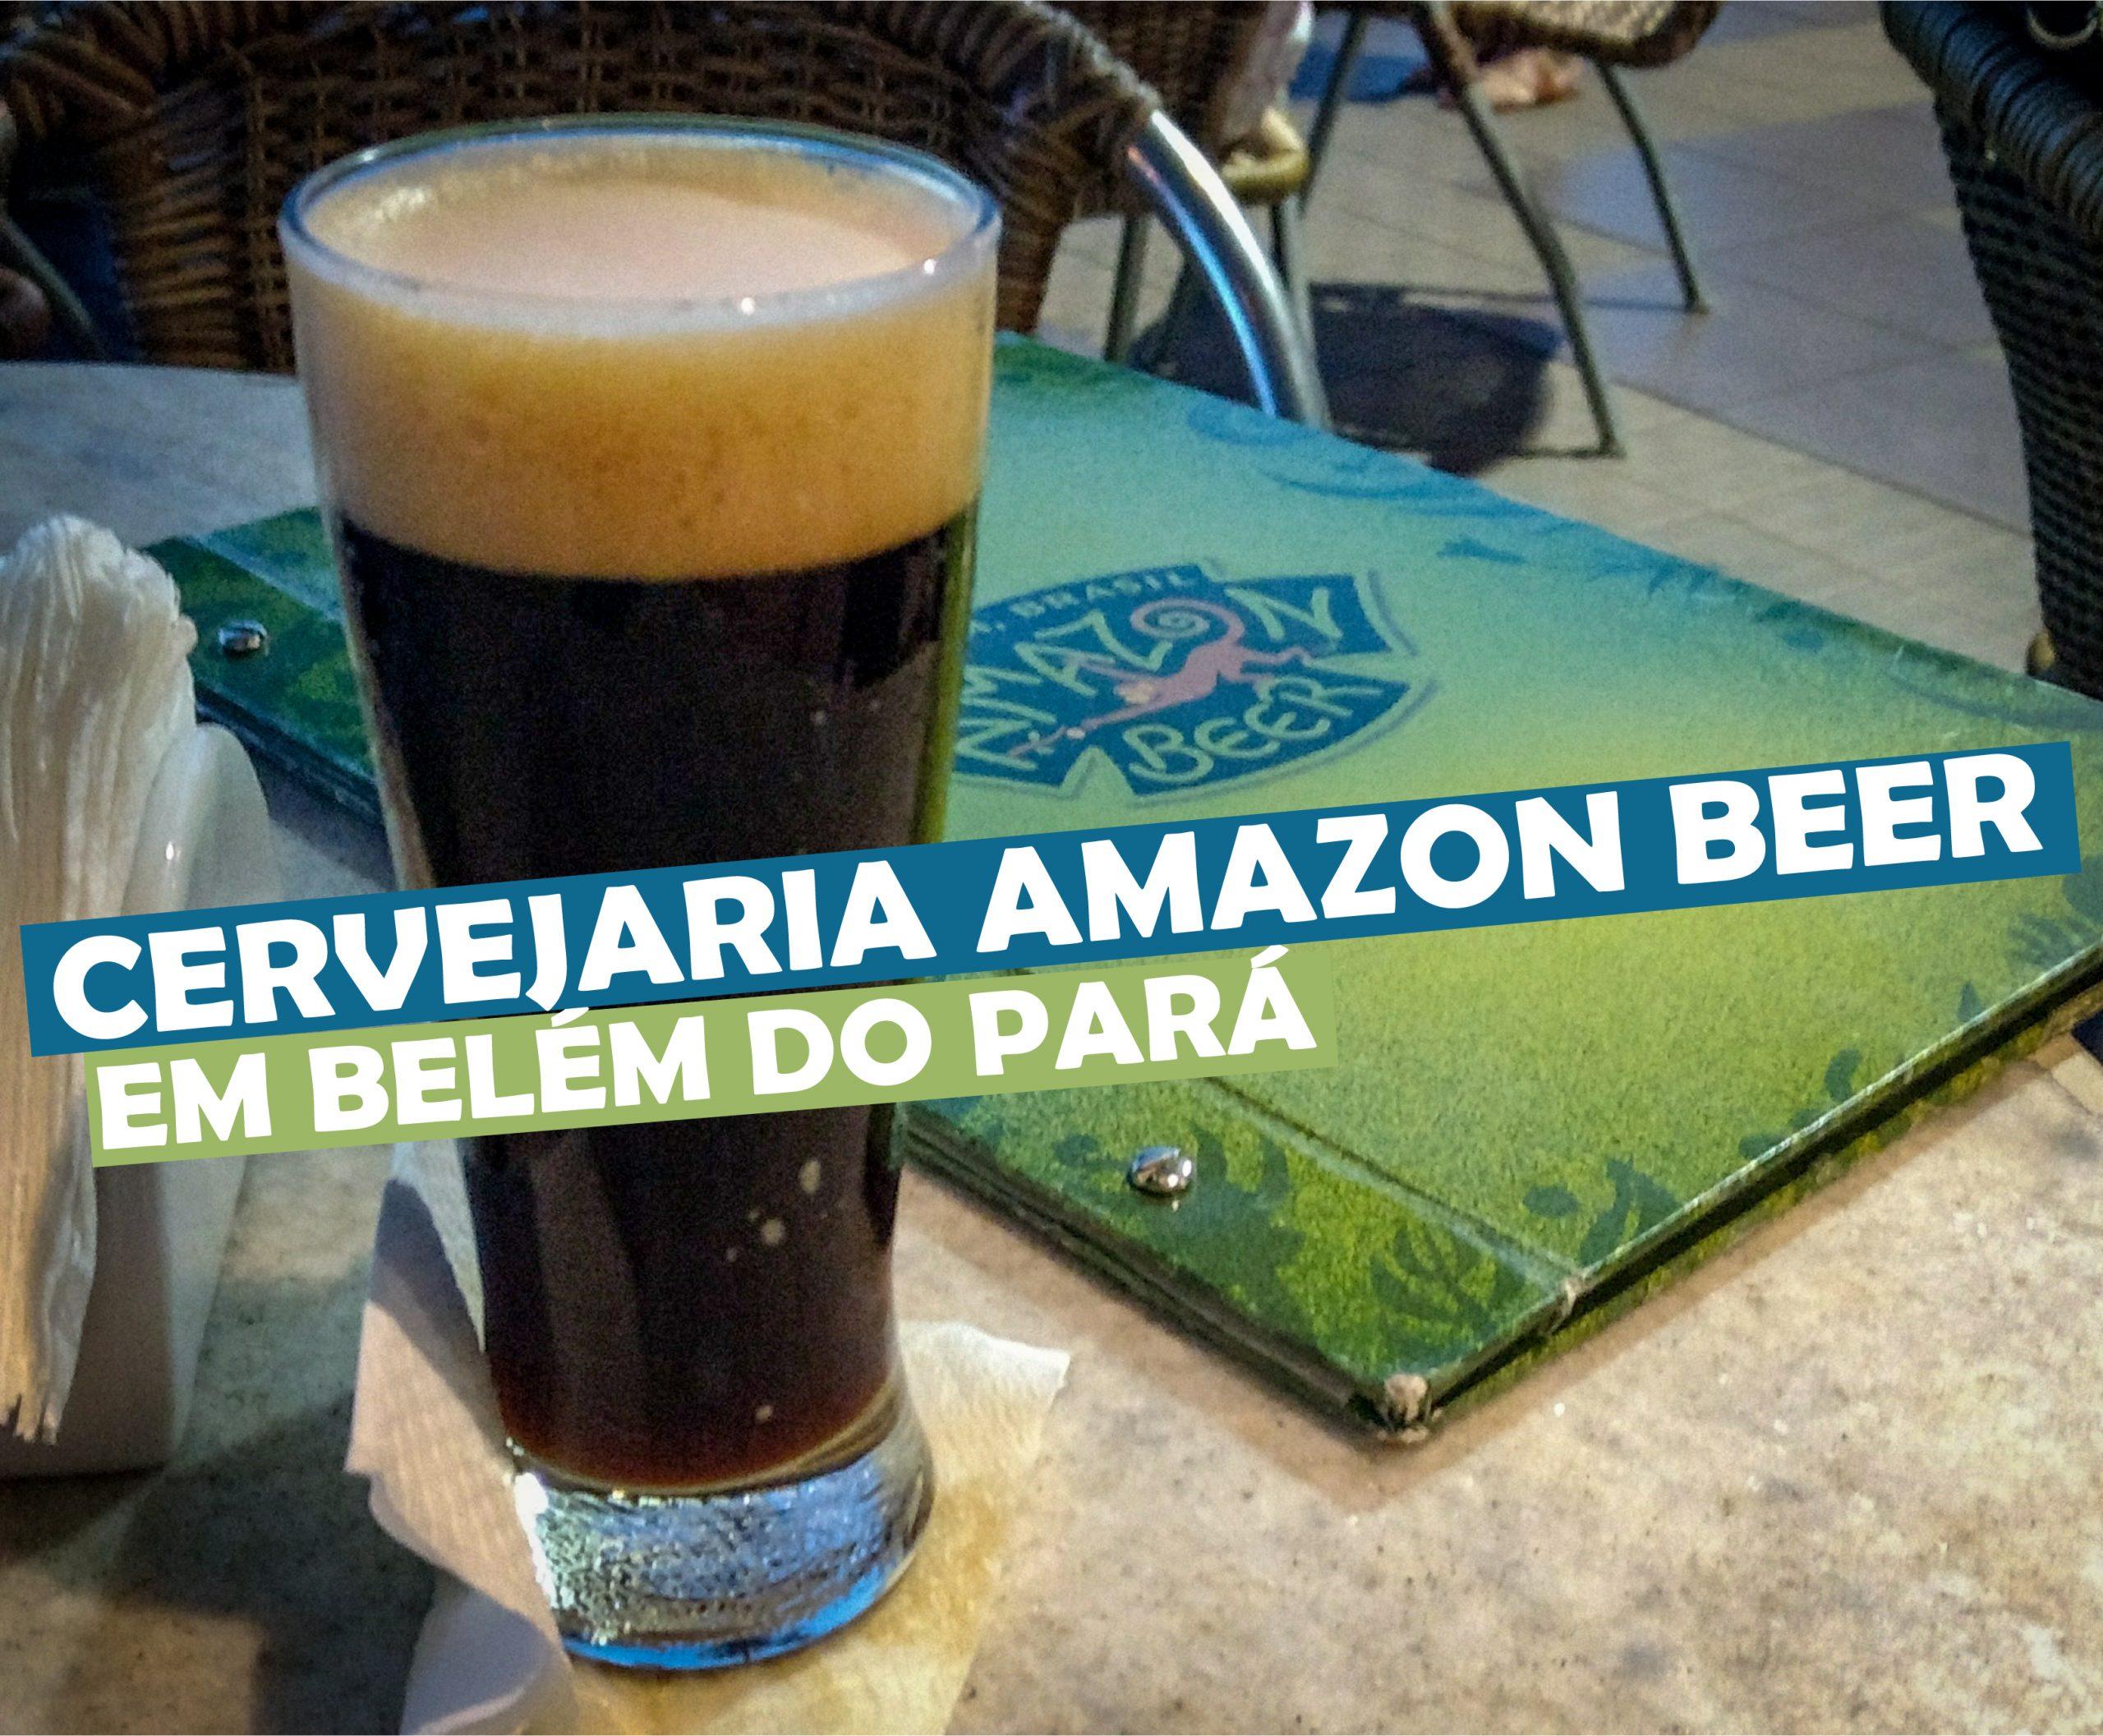 You are currently viewing Cervejaria Amazon Beer em Belém do Pará